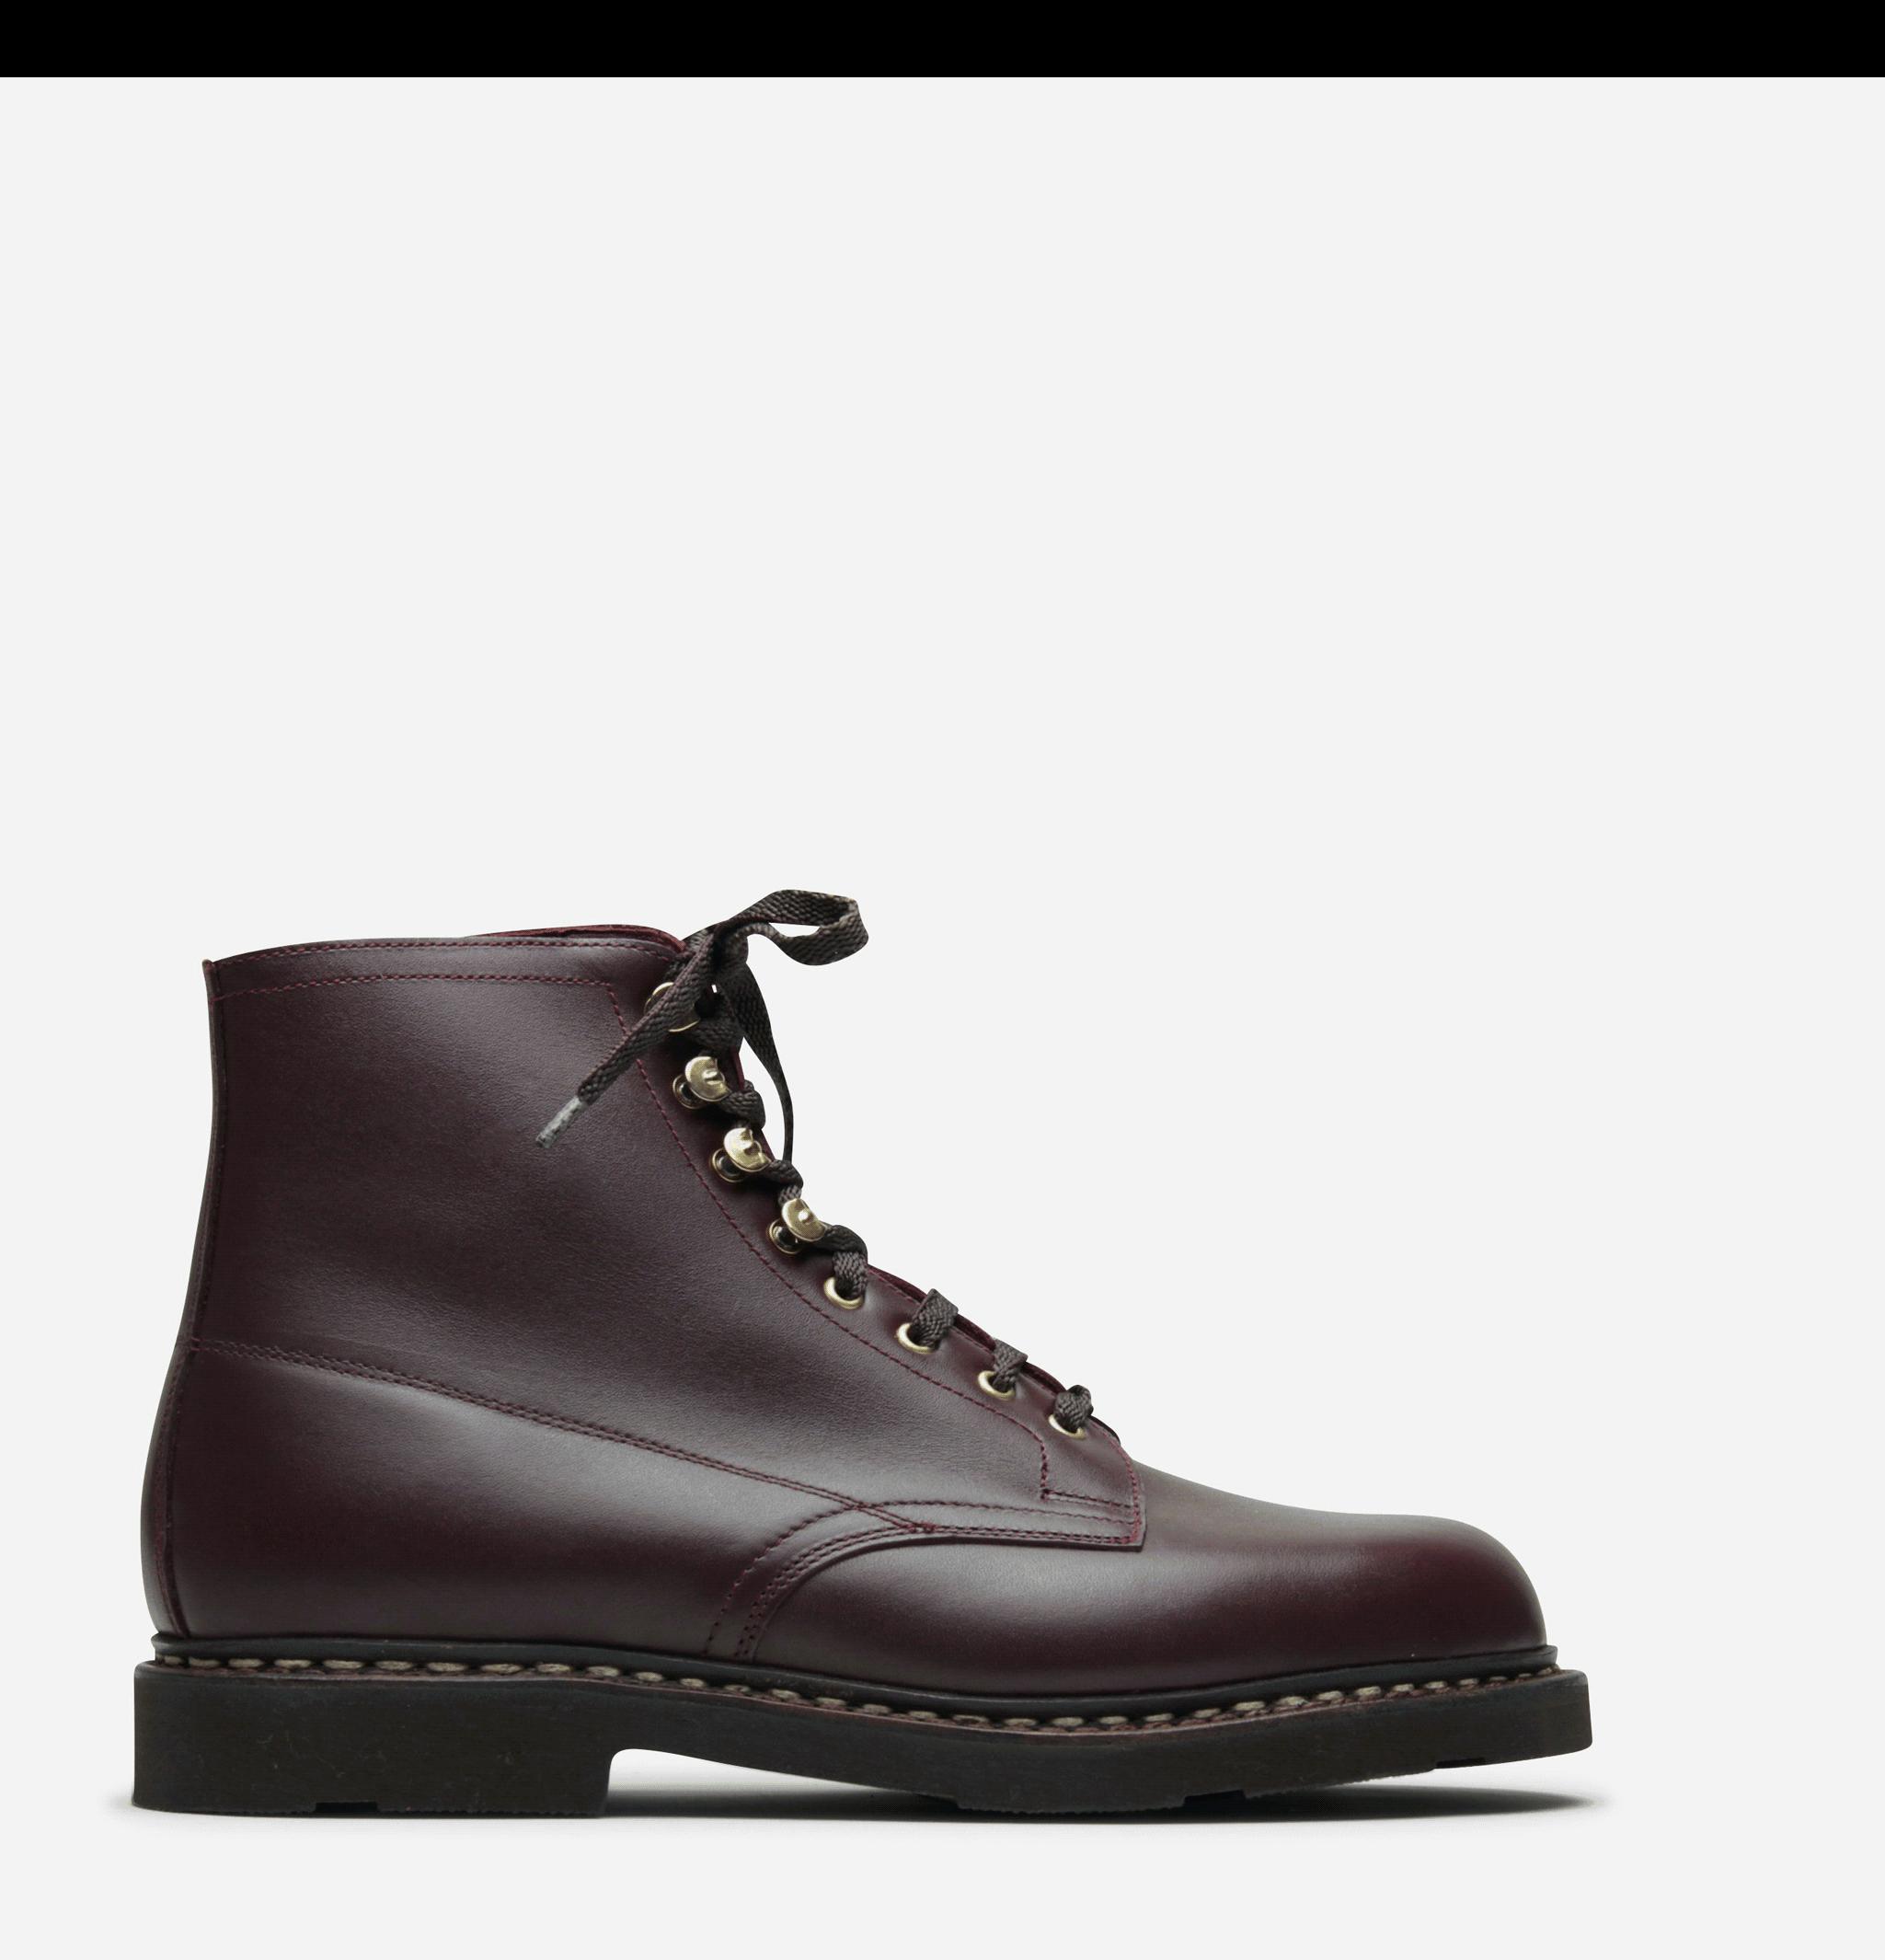 Chaussures Imbattable Acajou